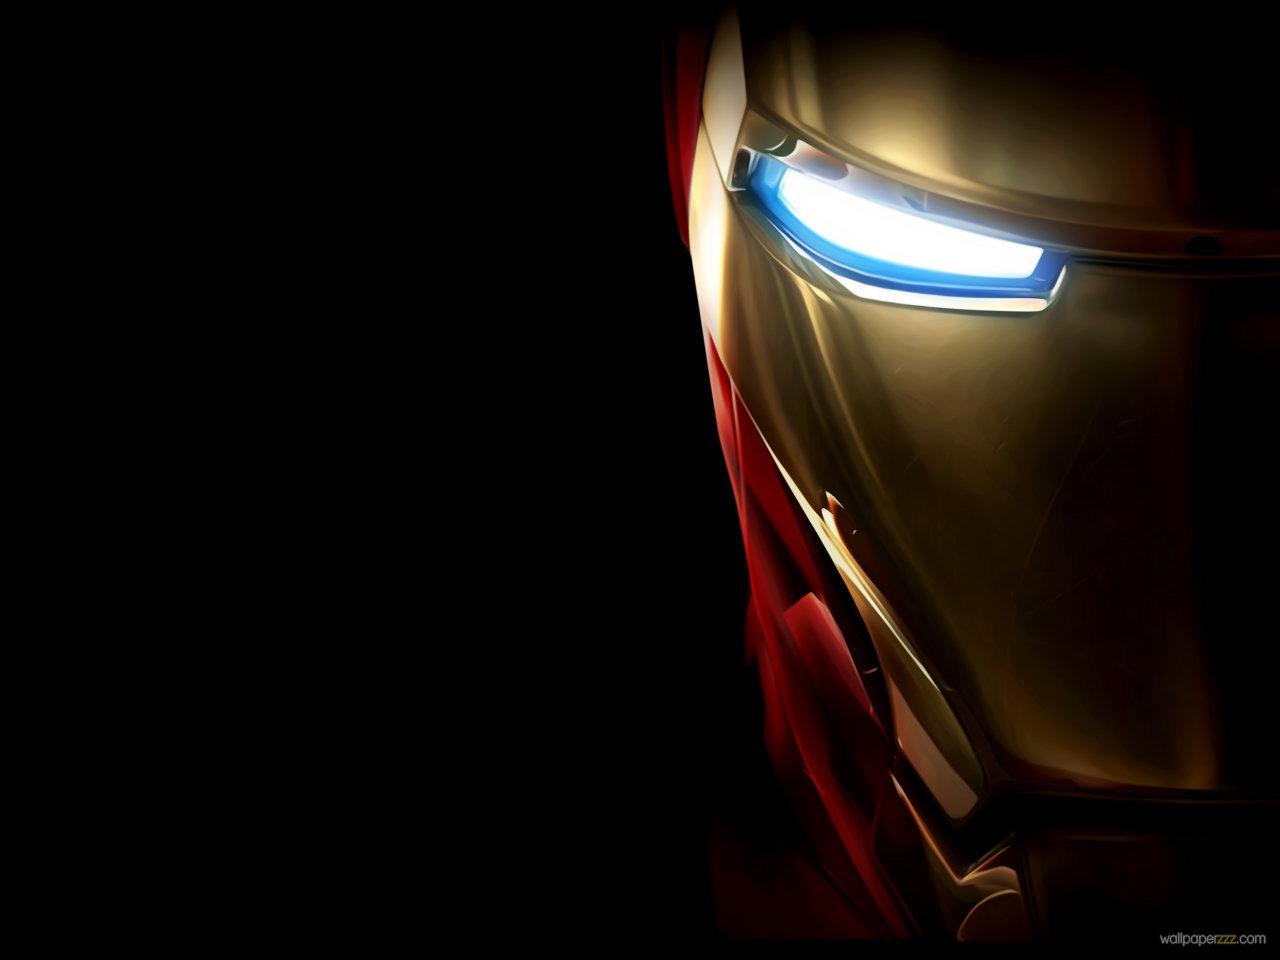 Iron man screensavers and wallpaper wallpapersafari for Sfondi iron man